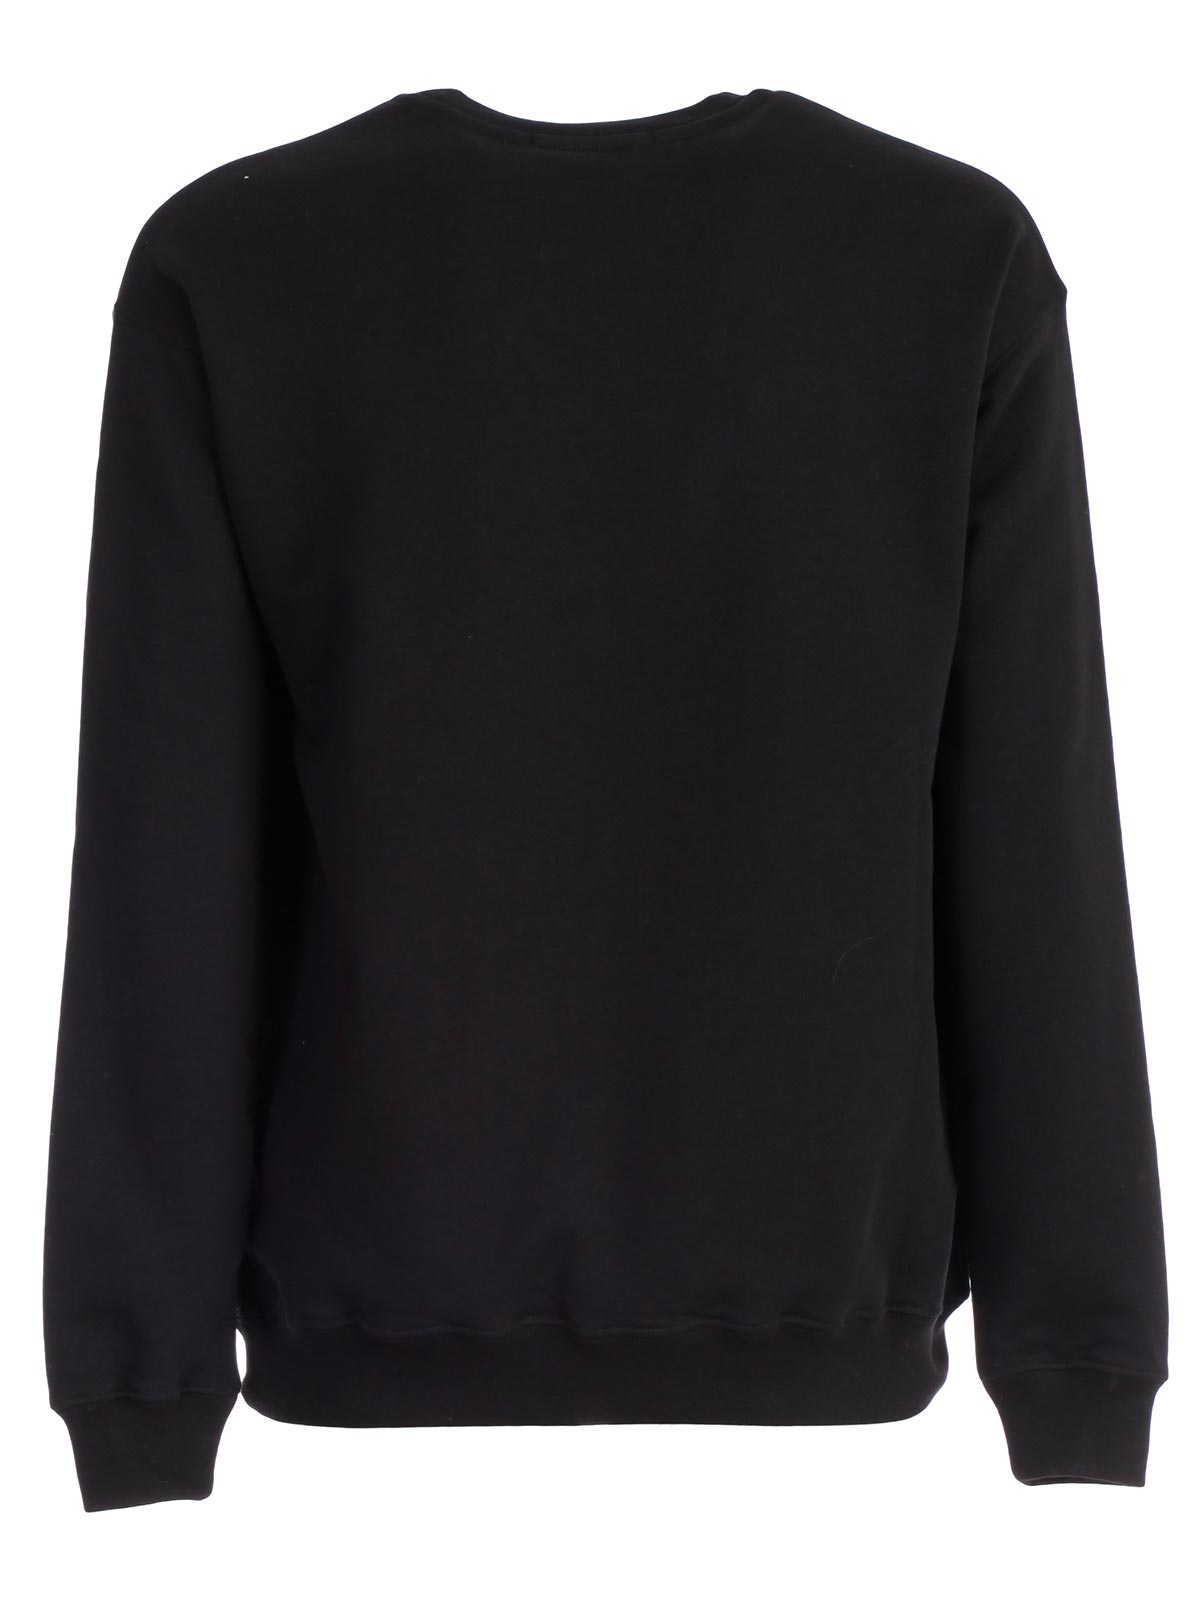 b3409e465ff6 Msgm Sweatshirt 2640MM193.195299 - 99 BLACK.Bernardelli Store ...